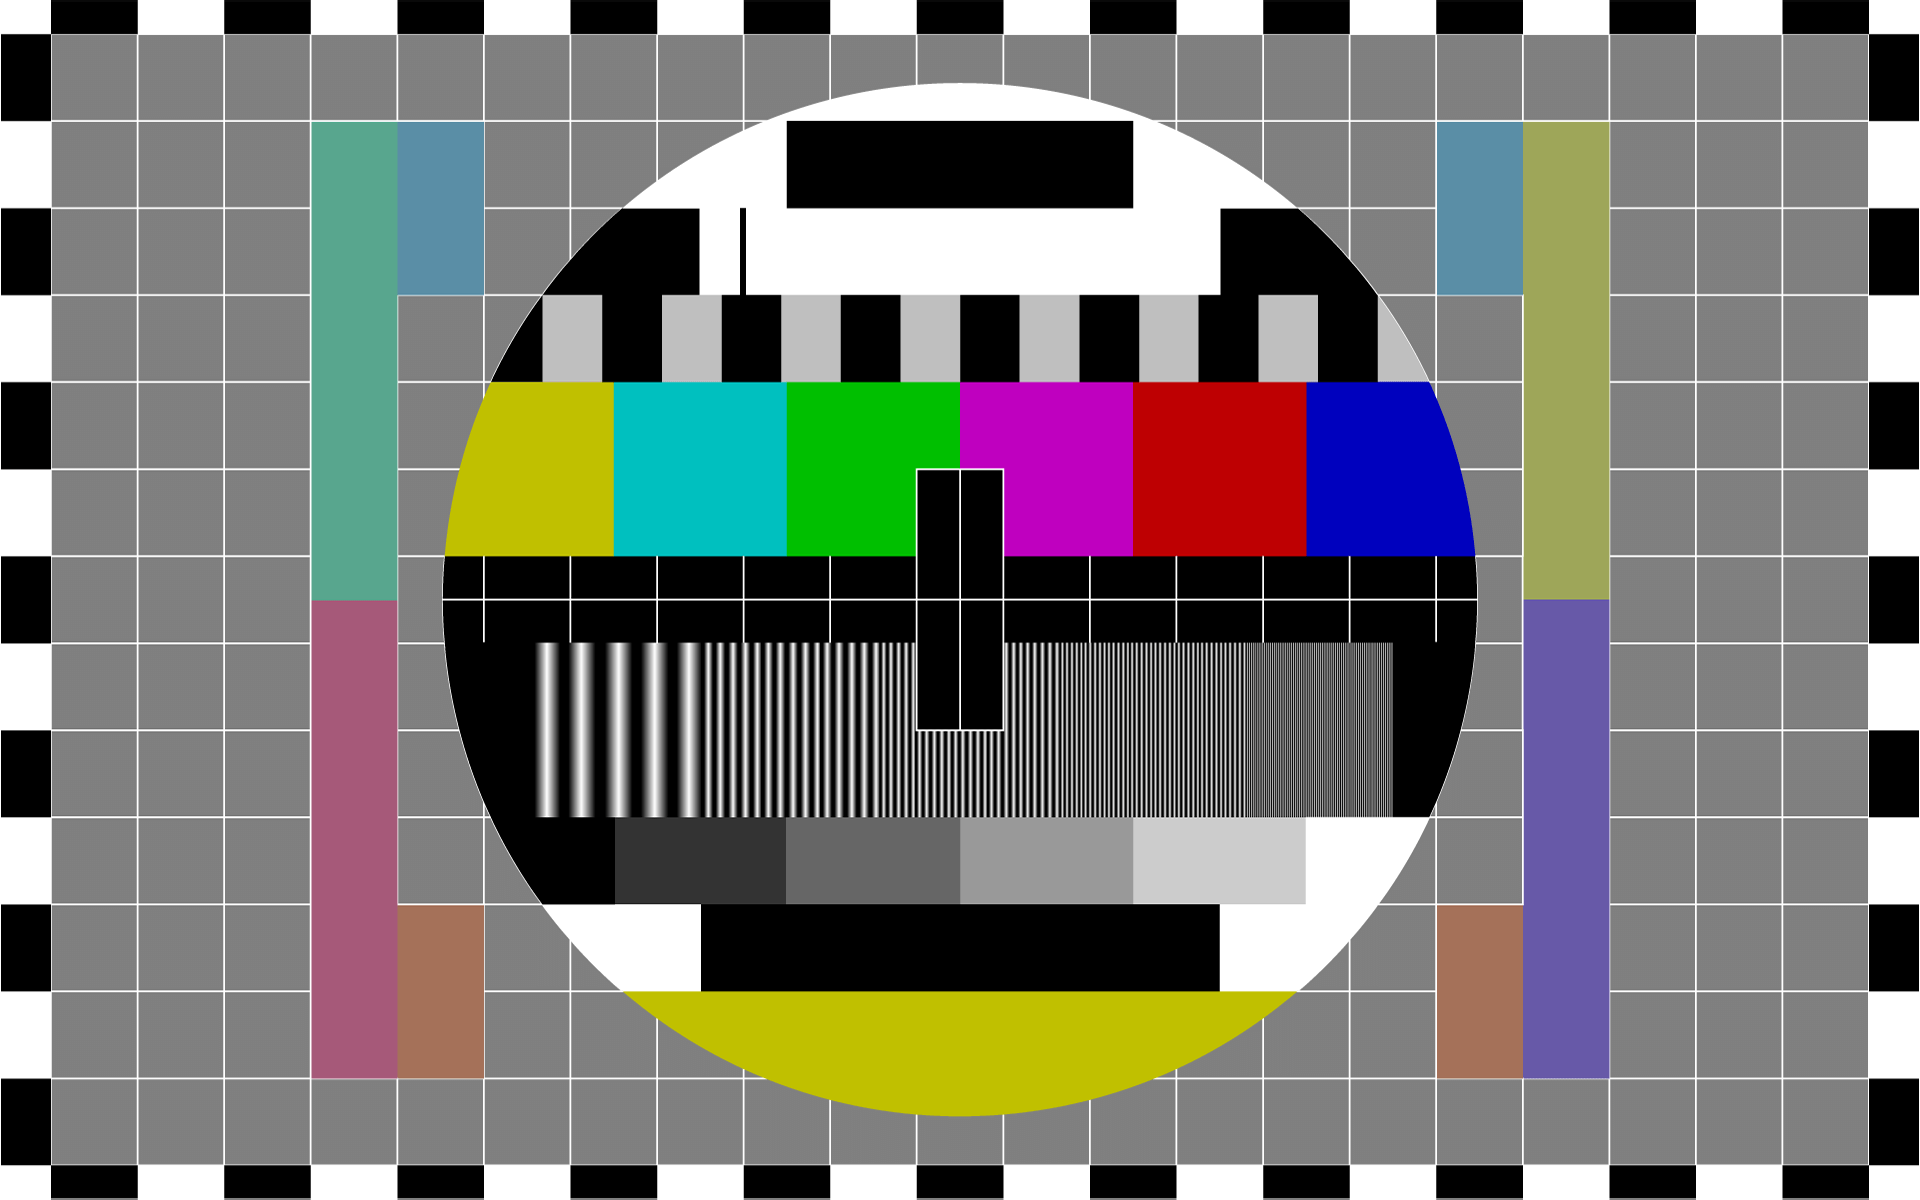 tvmuster_1920x1200